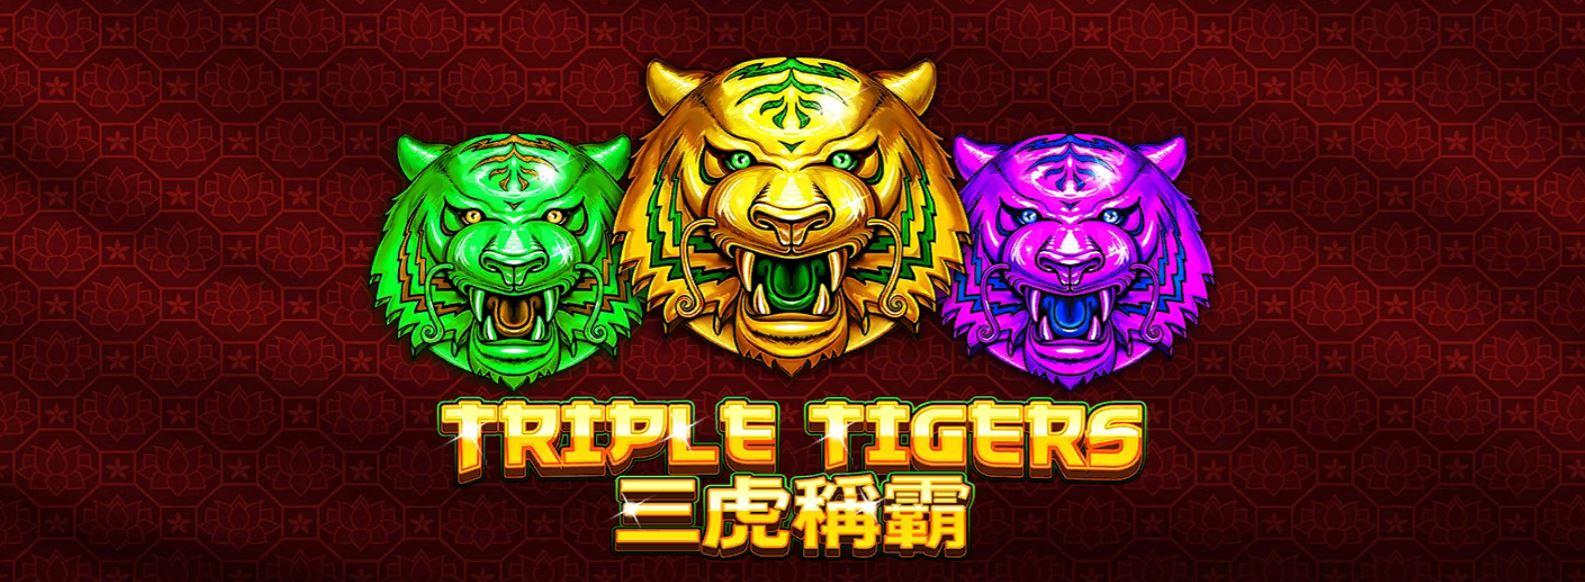 slotxo-triple tigers